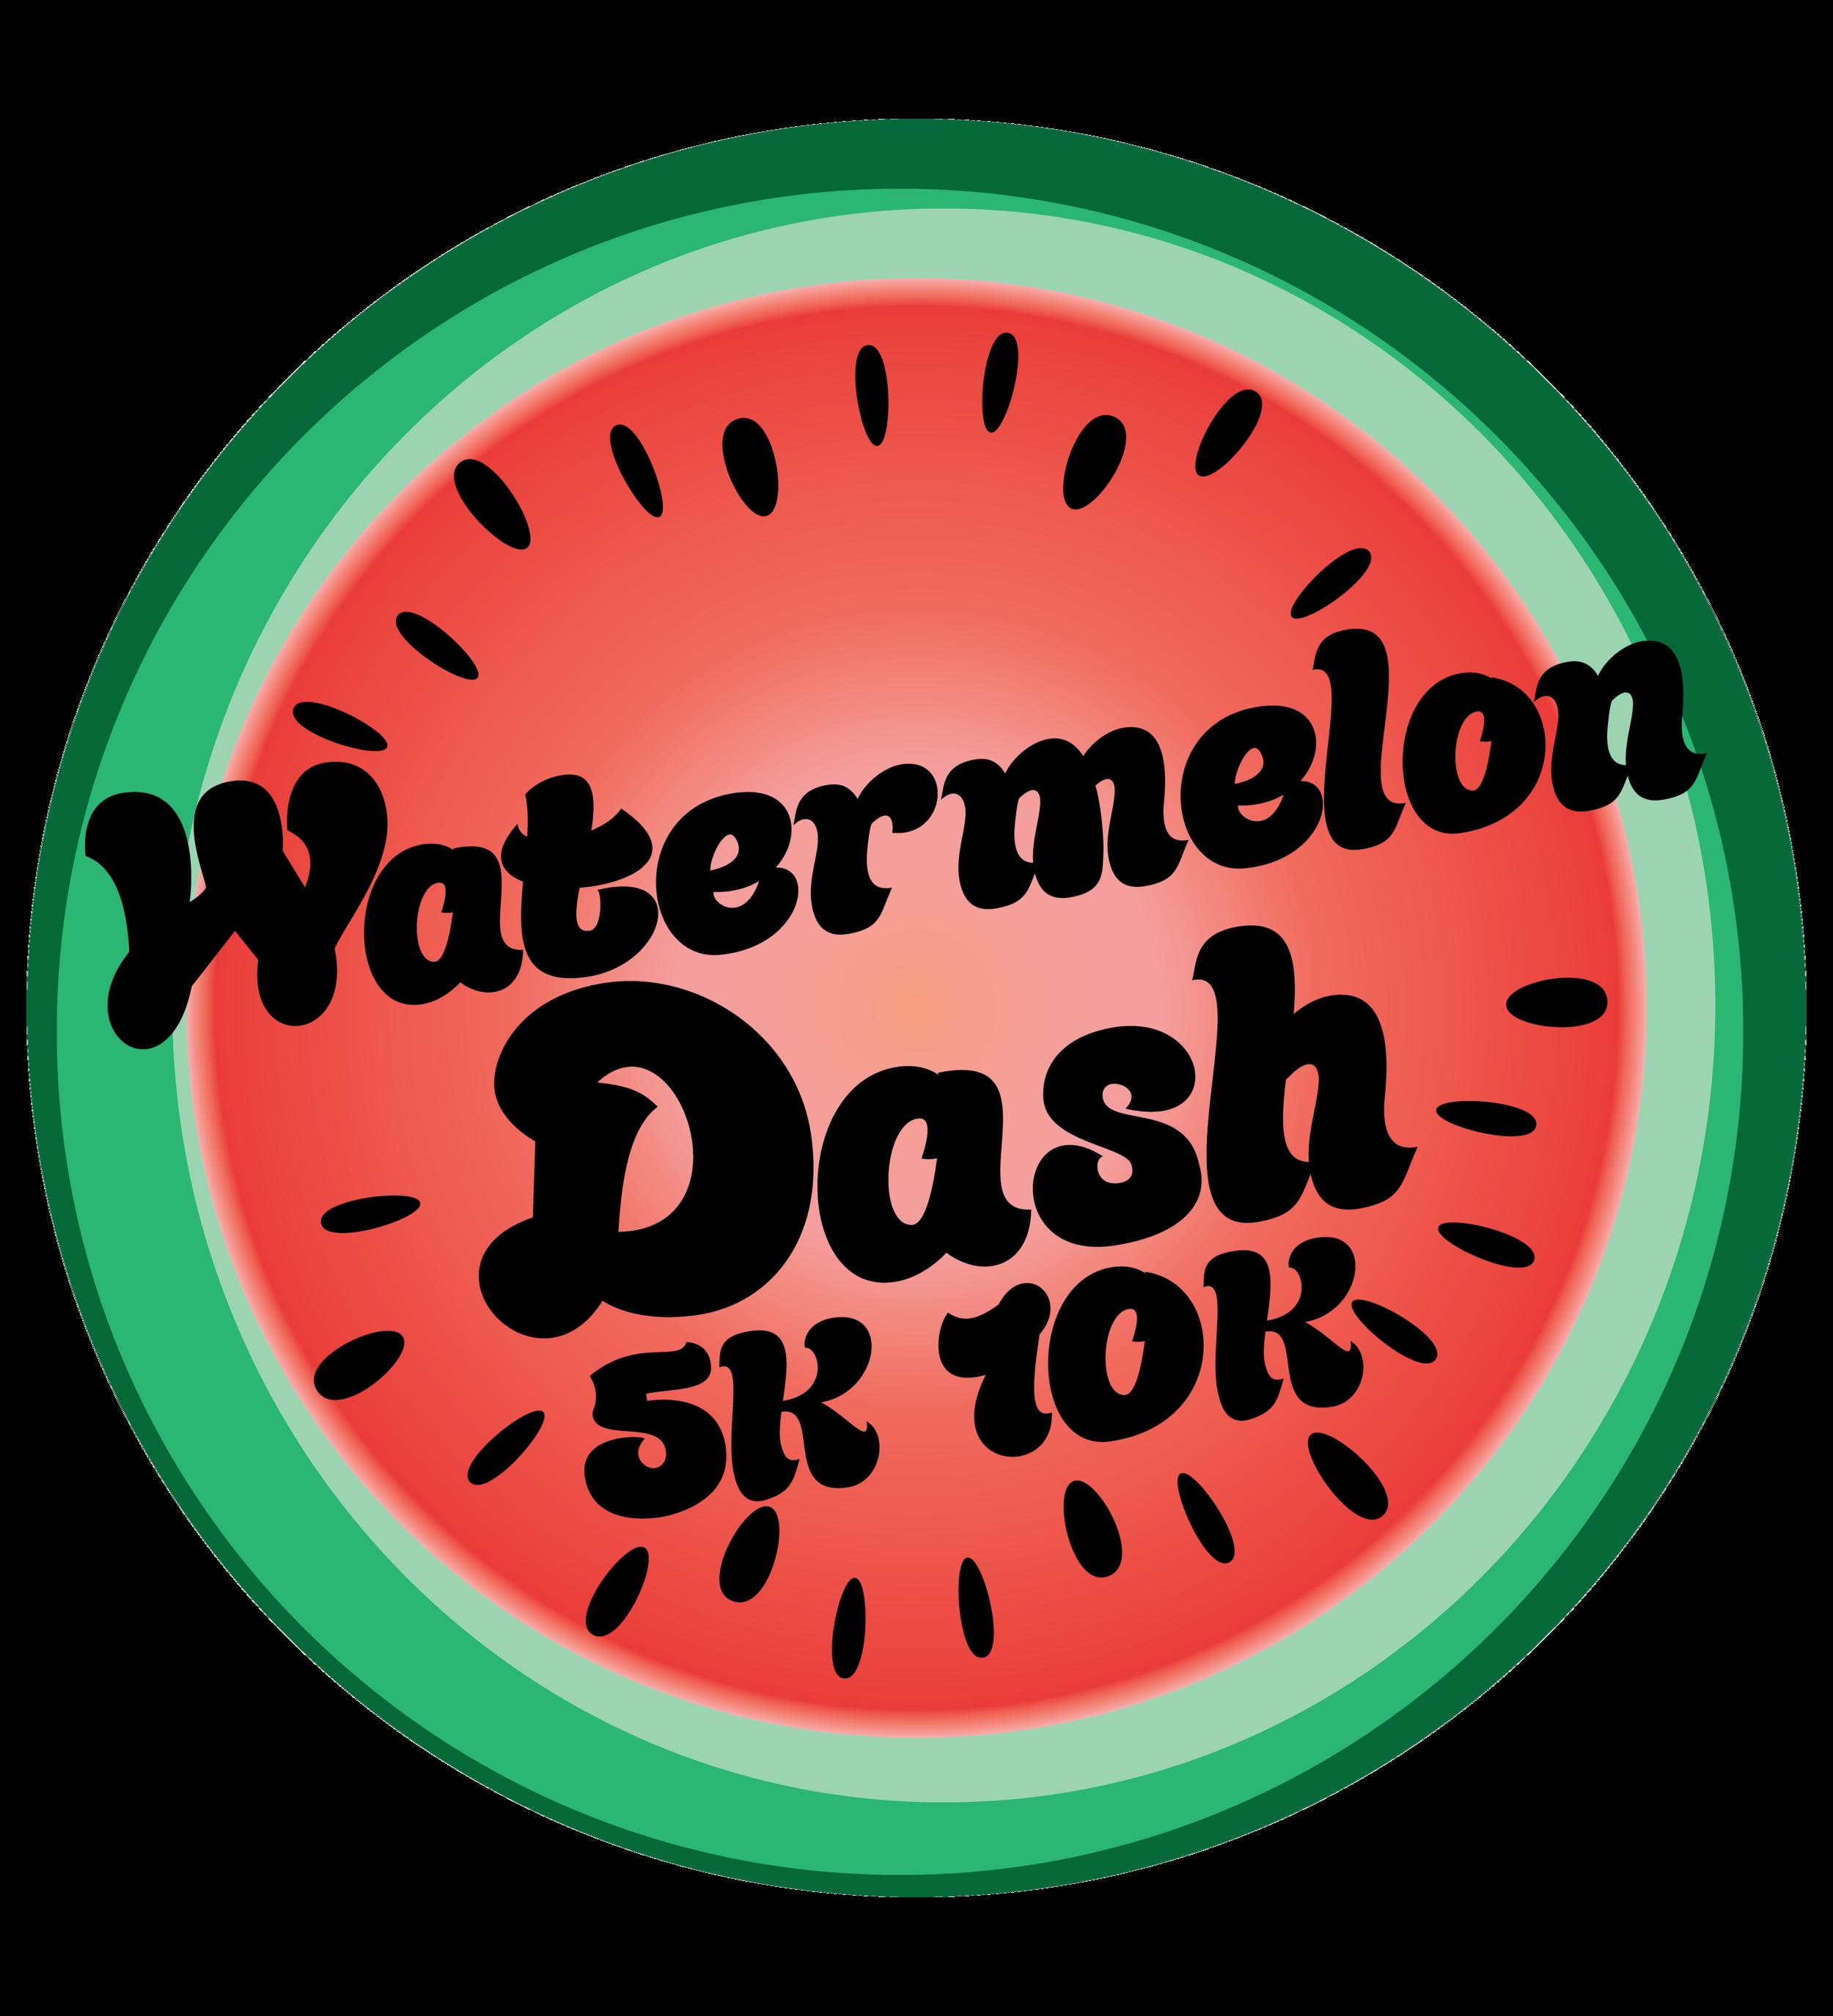 WatermelonDash5K10K.png